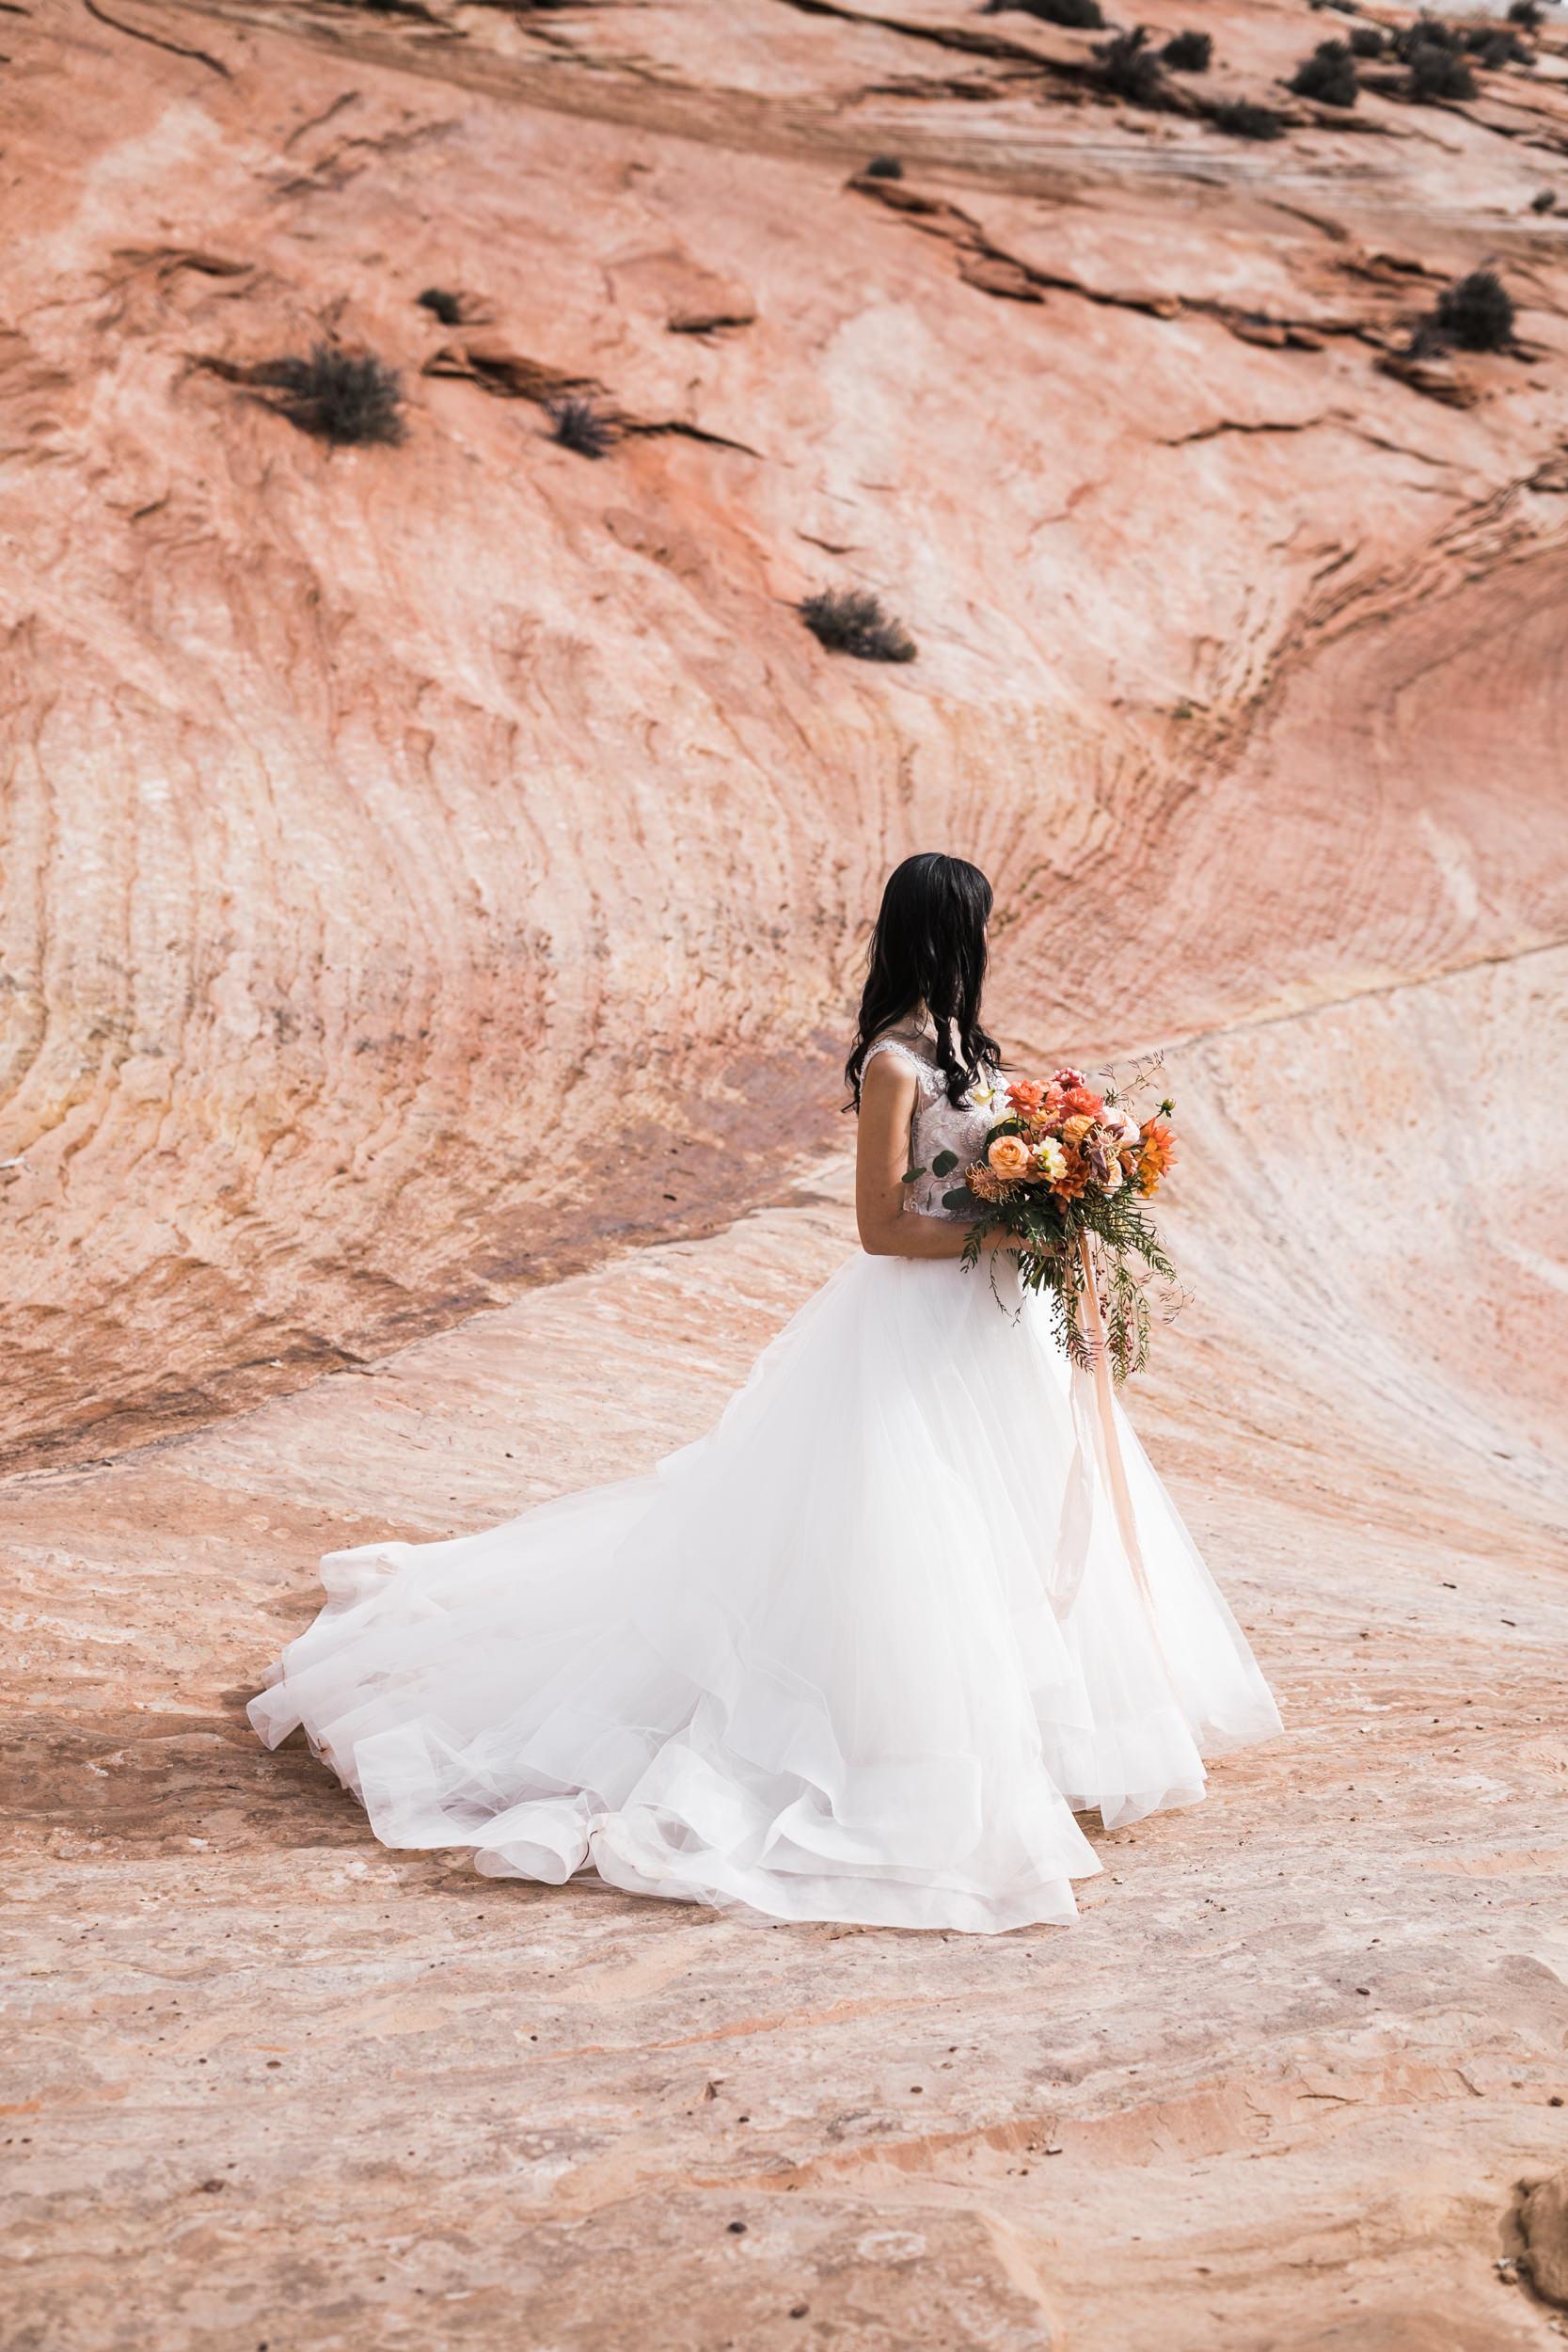 Hiking Elopement Adventure Bride The Hearnes